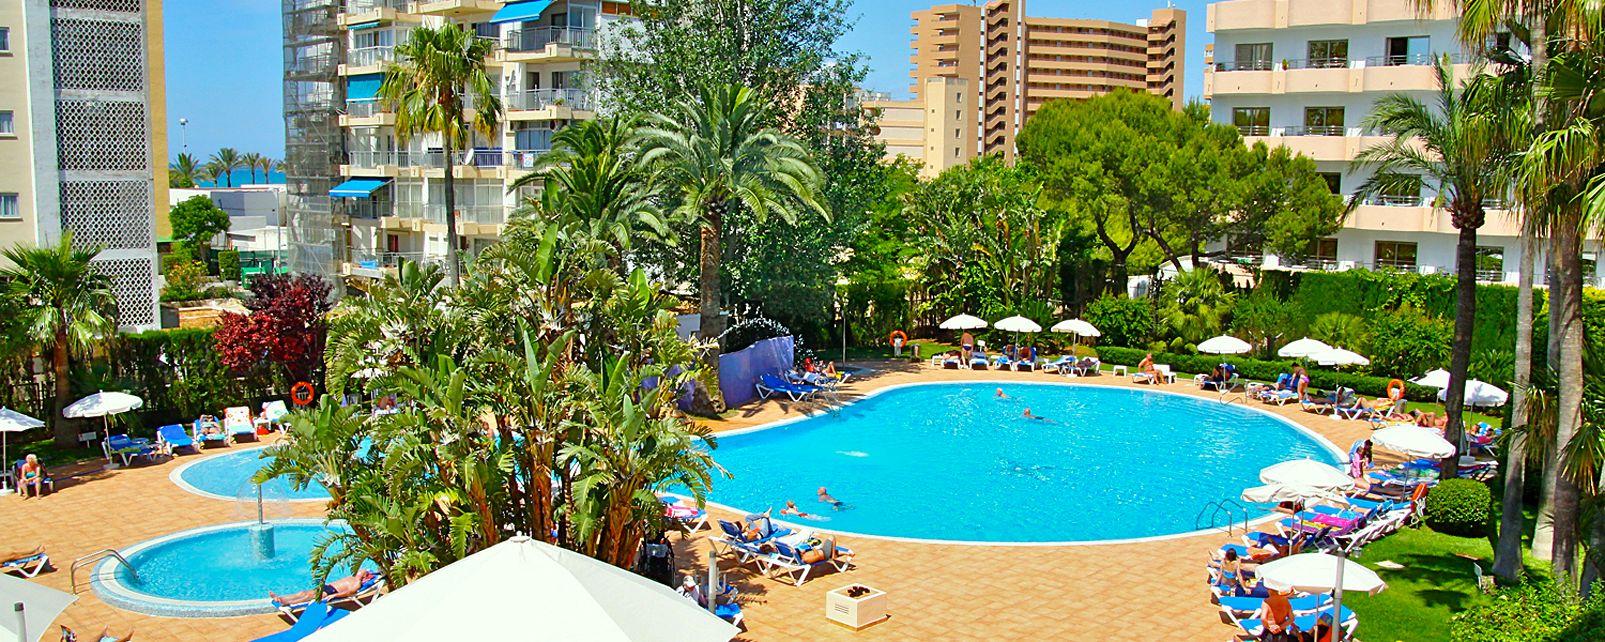 Hotel Oleander Mallorca Playa De Palma